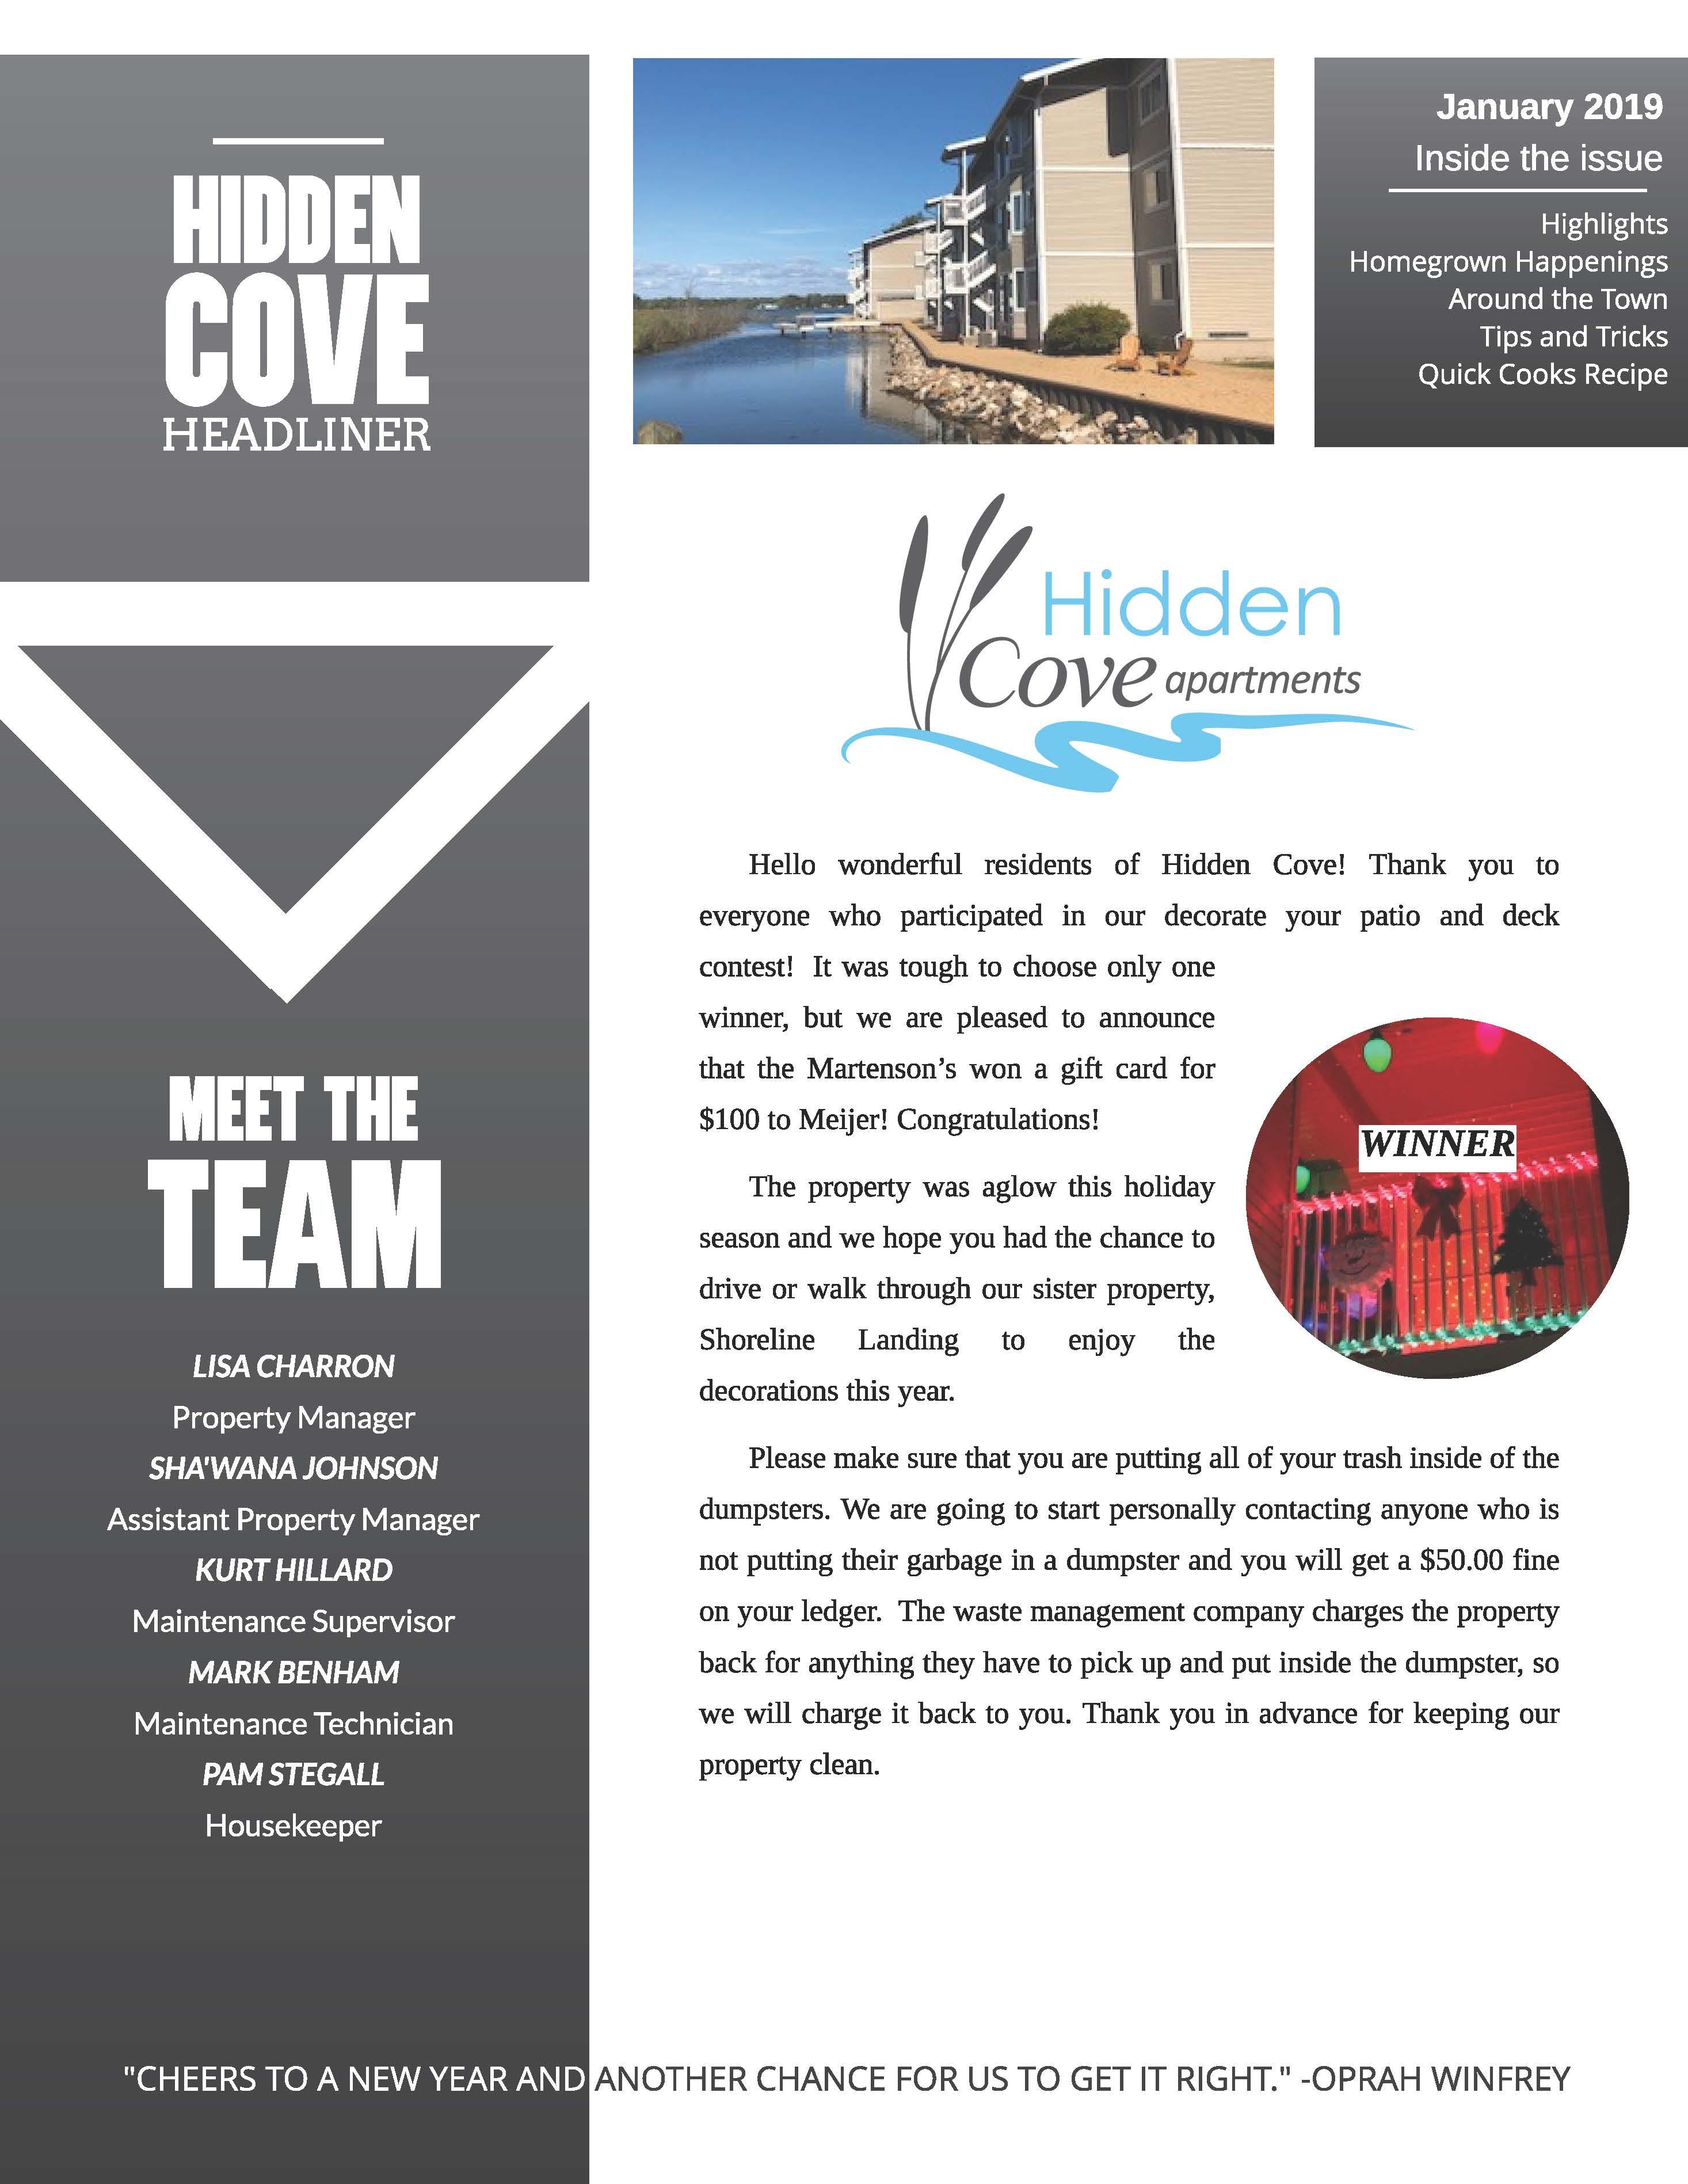 The Hidden Cove Community